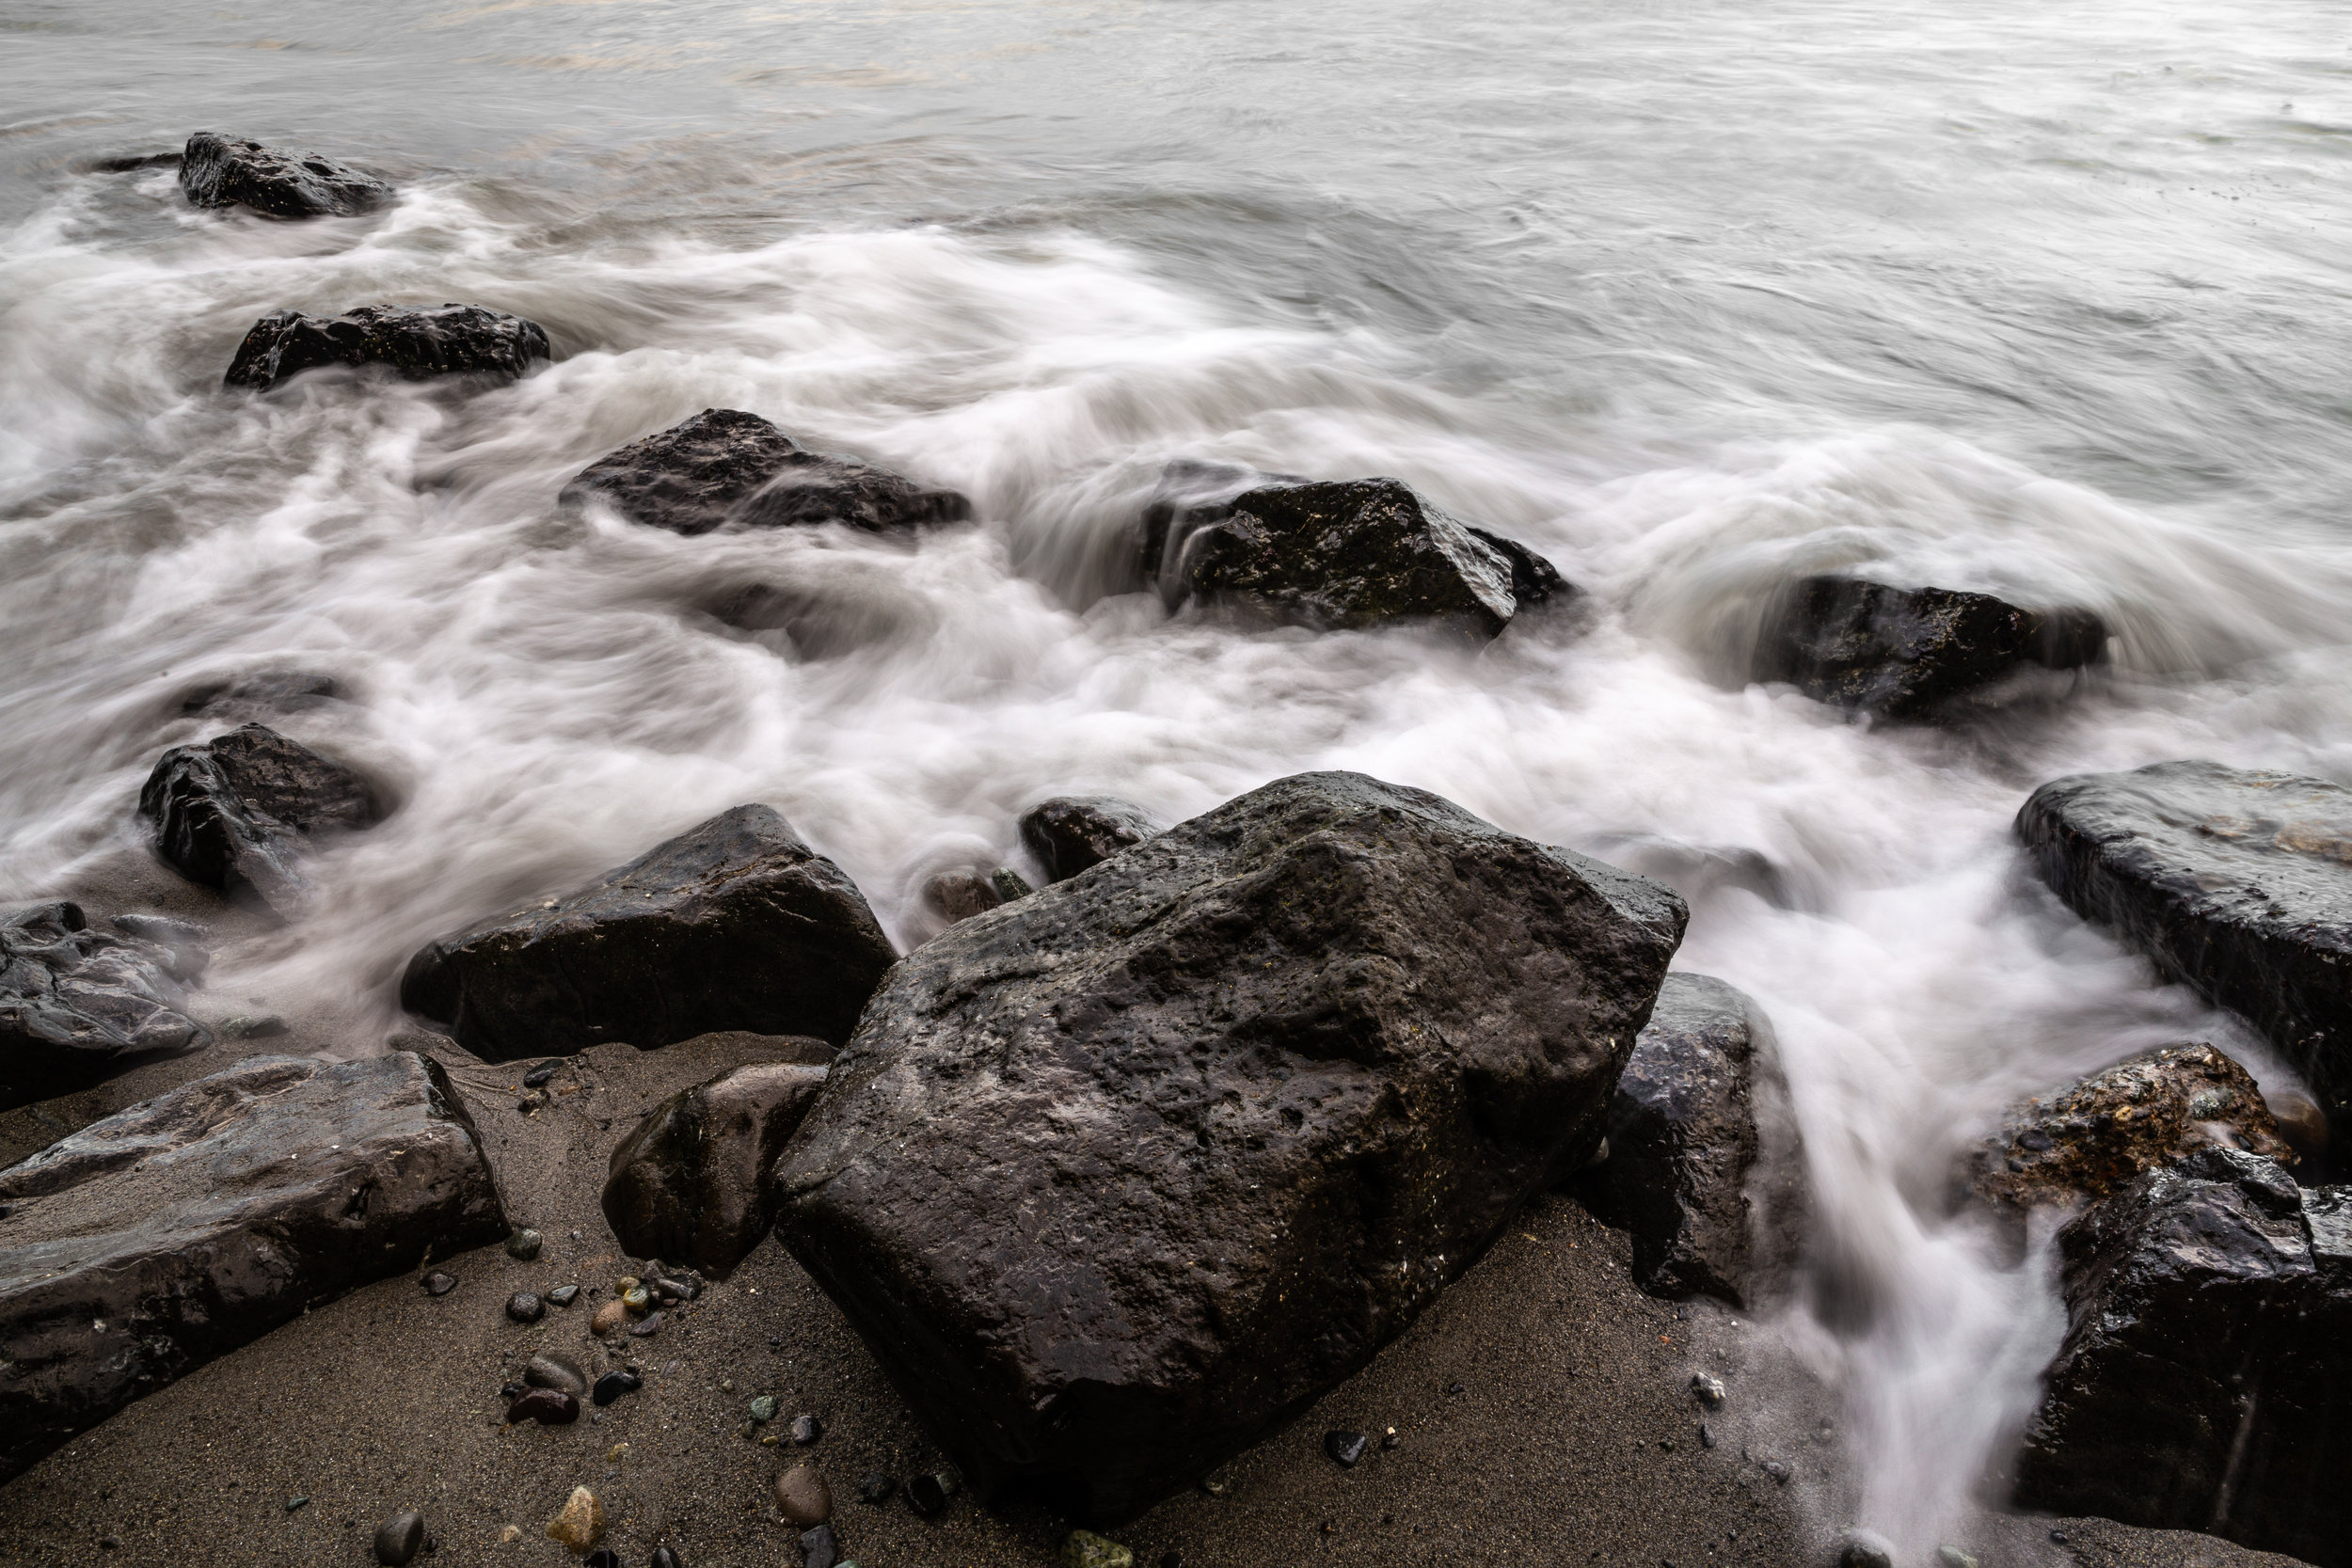 2 Port Townsend Sunset Beach long exposure may 28th 2018 jenny l miller .jpg